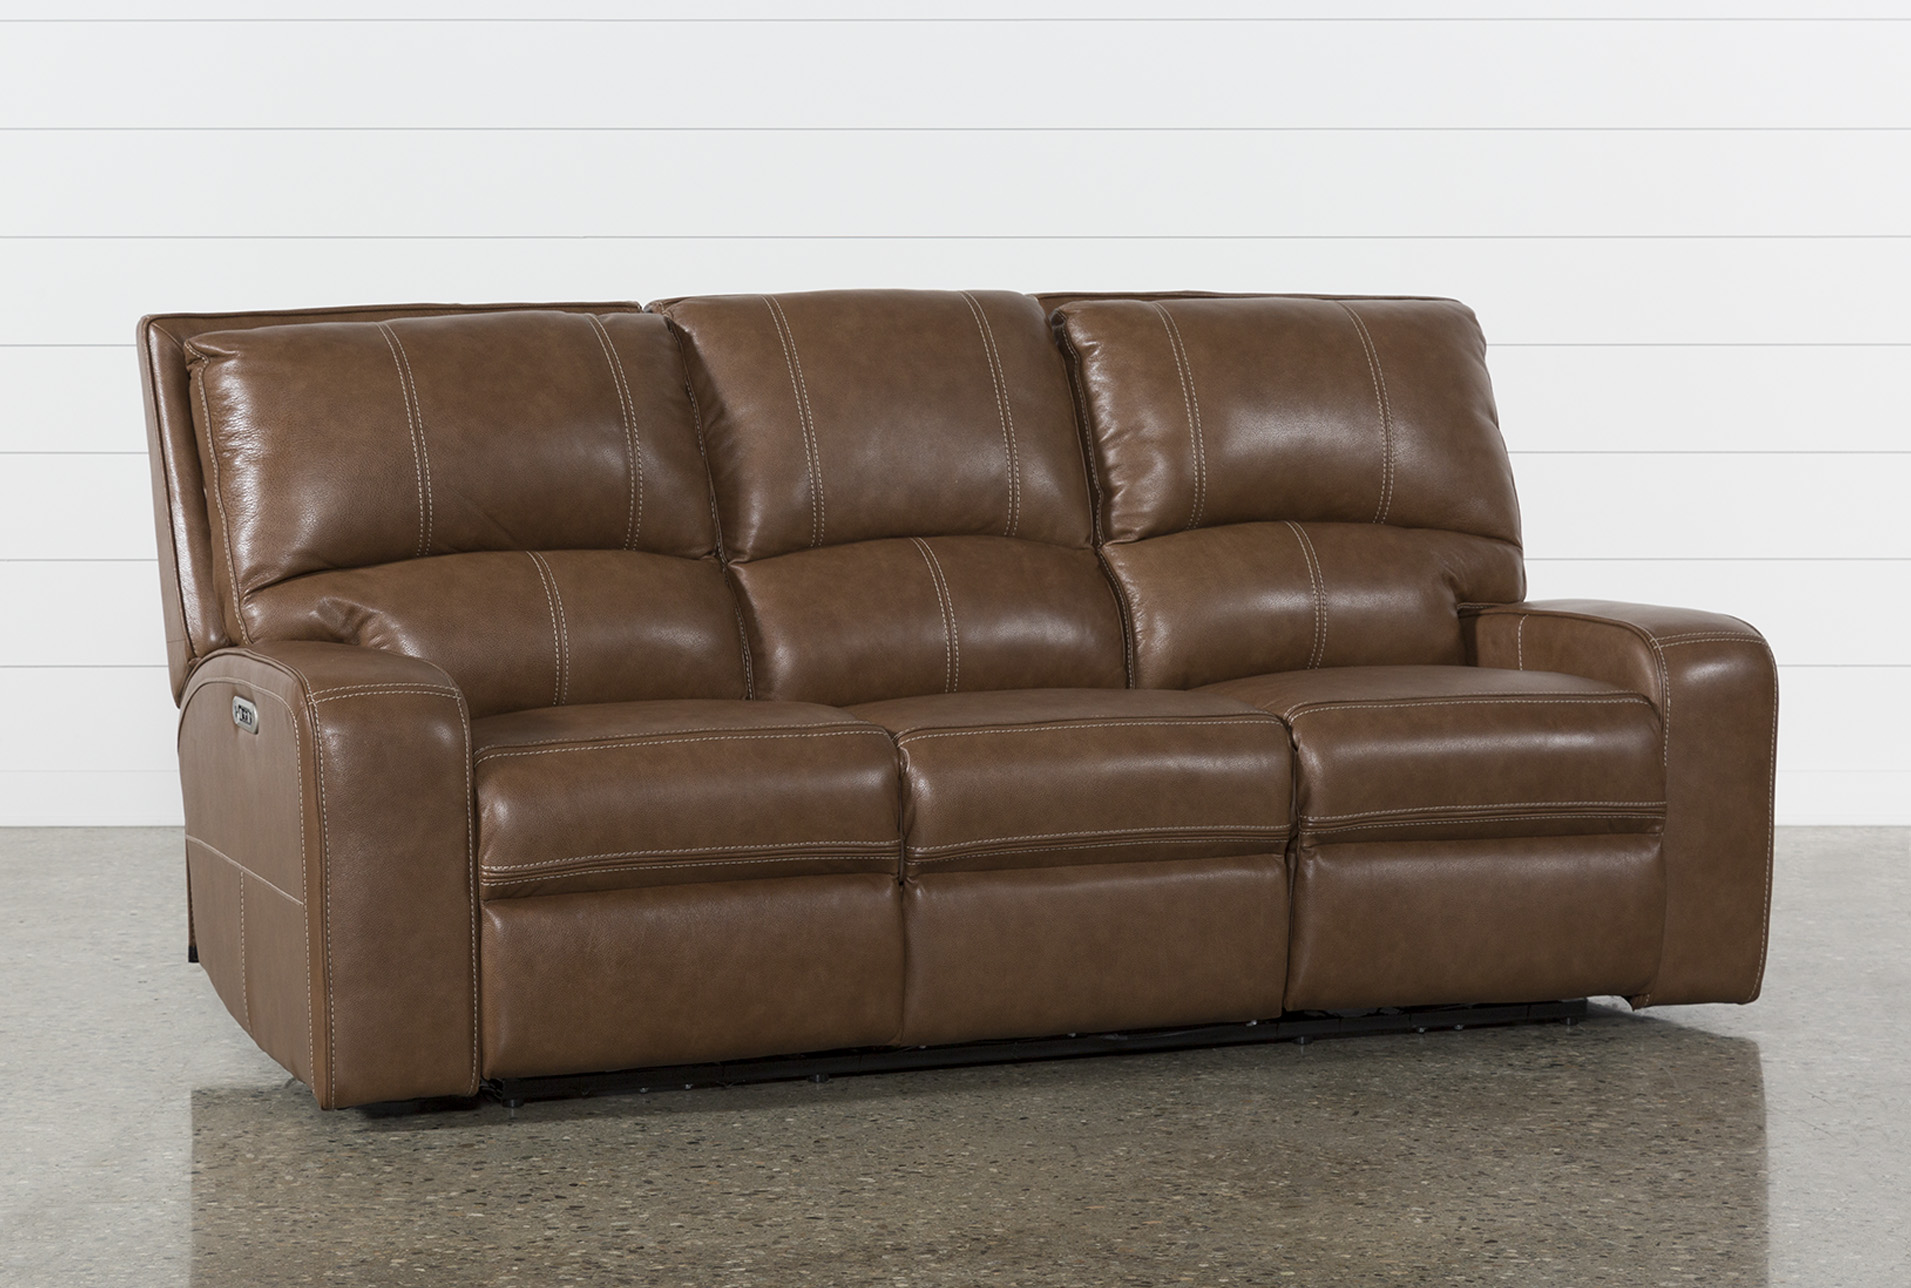 clyde saddle leather power reclining sofa w power headrest usb rh livingspaces com leather reclining sofas for sale leather recliner sofas uk